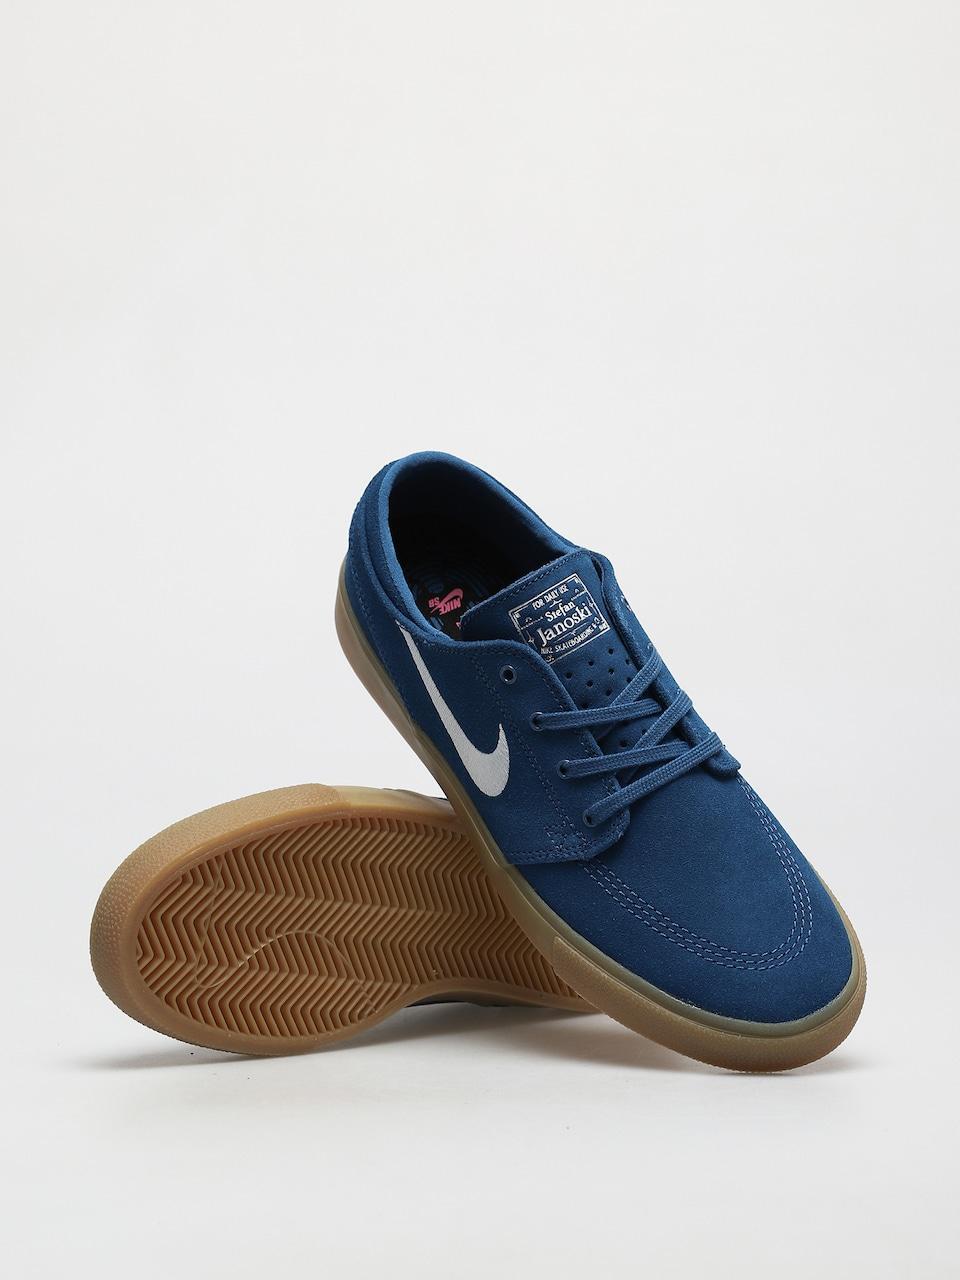 Nike SB Zoom Stefan Janoski RM Shoes (court blue/white court blue)